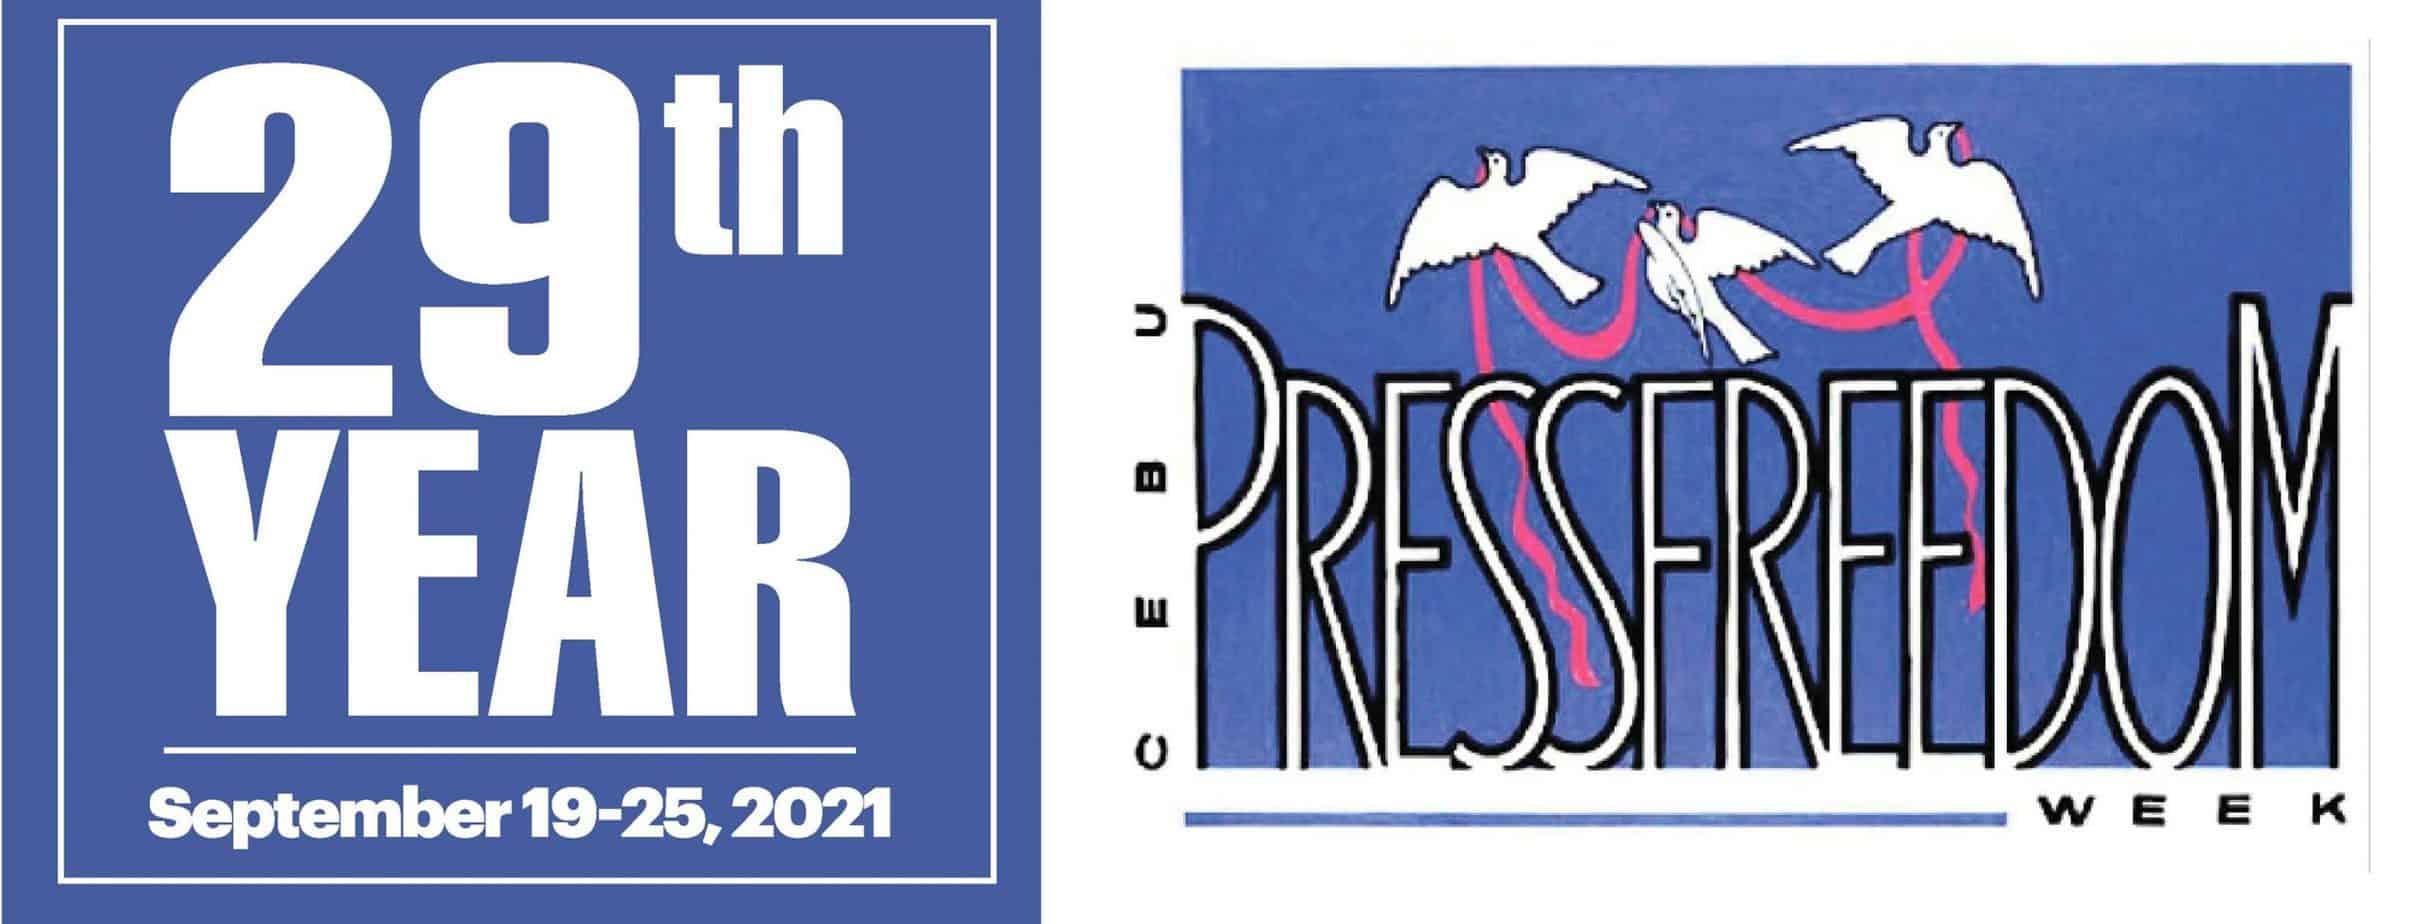 Celebrating Cebu Press Freedom Week